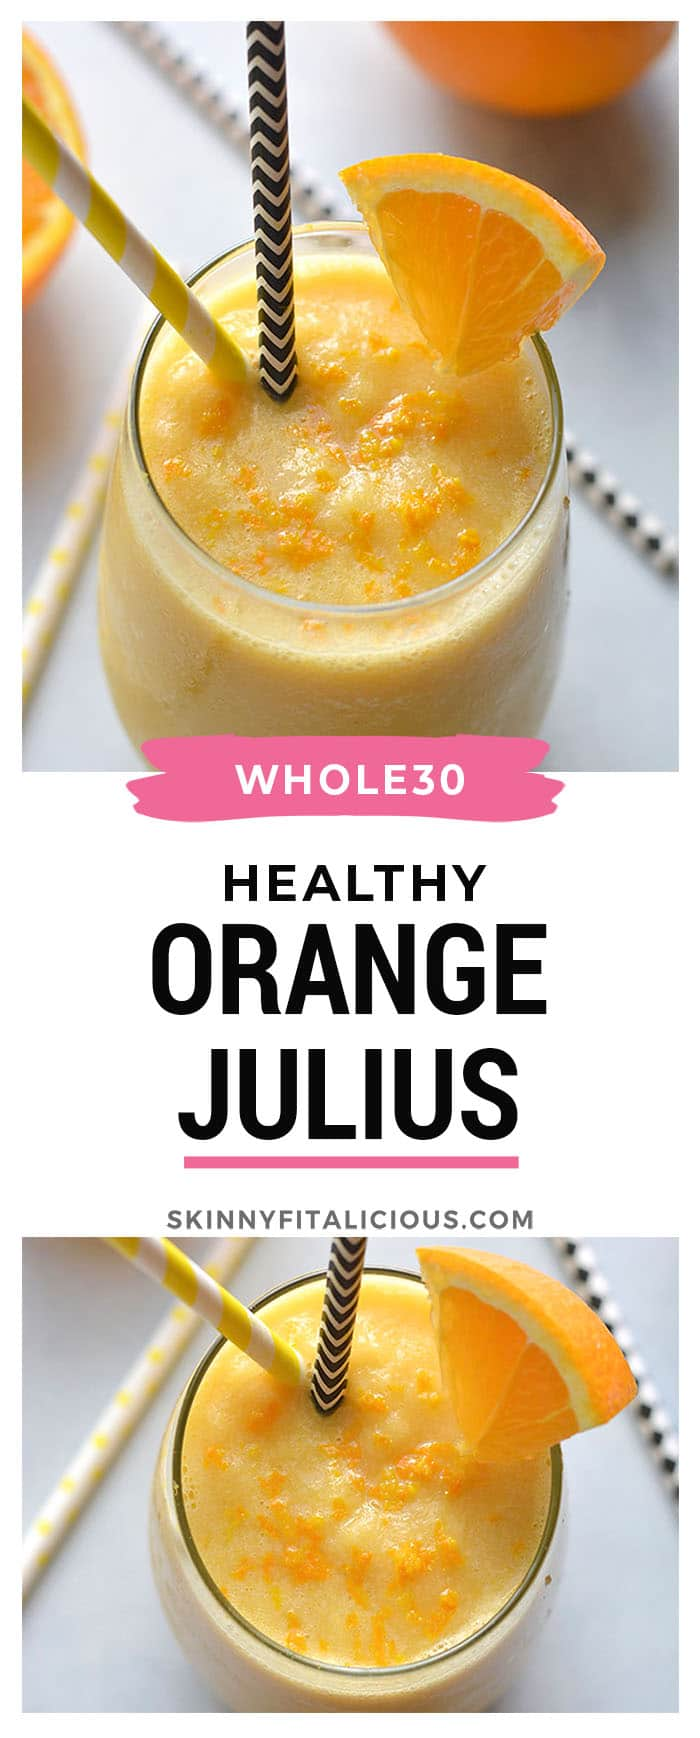 Healthy Orange Julius Whole30 Paleo Gf Vegan Skinny